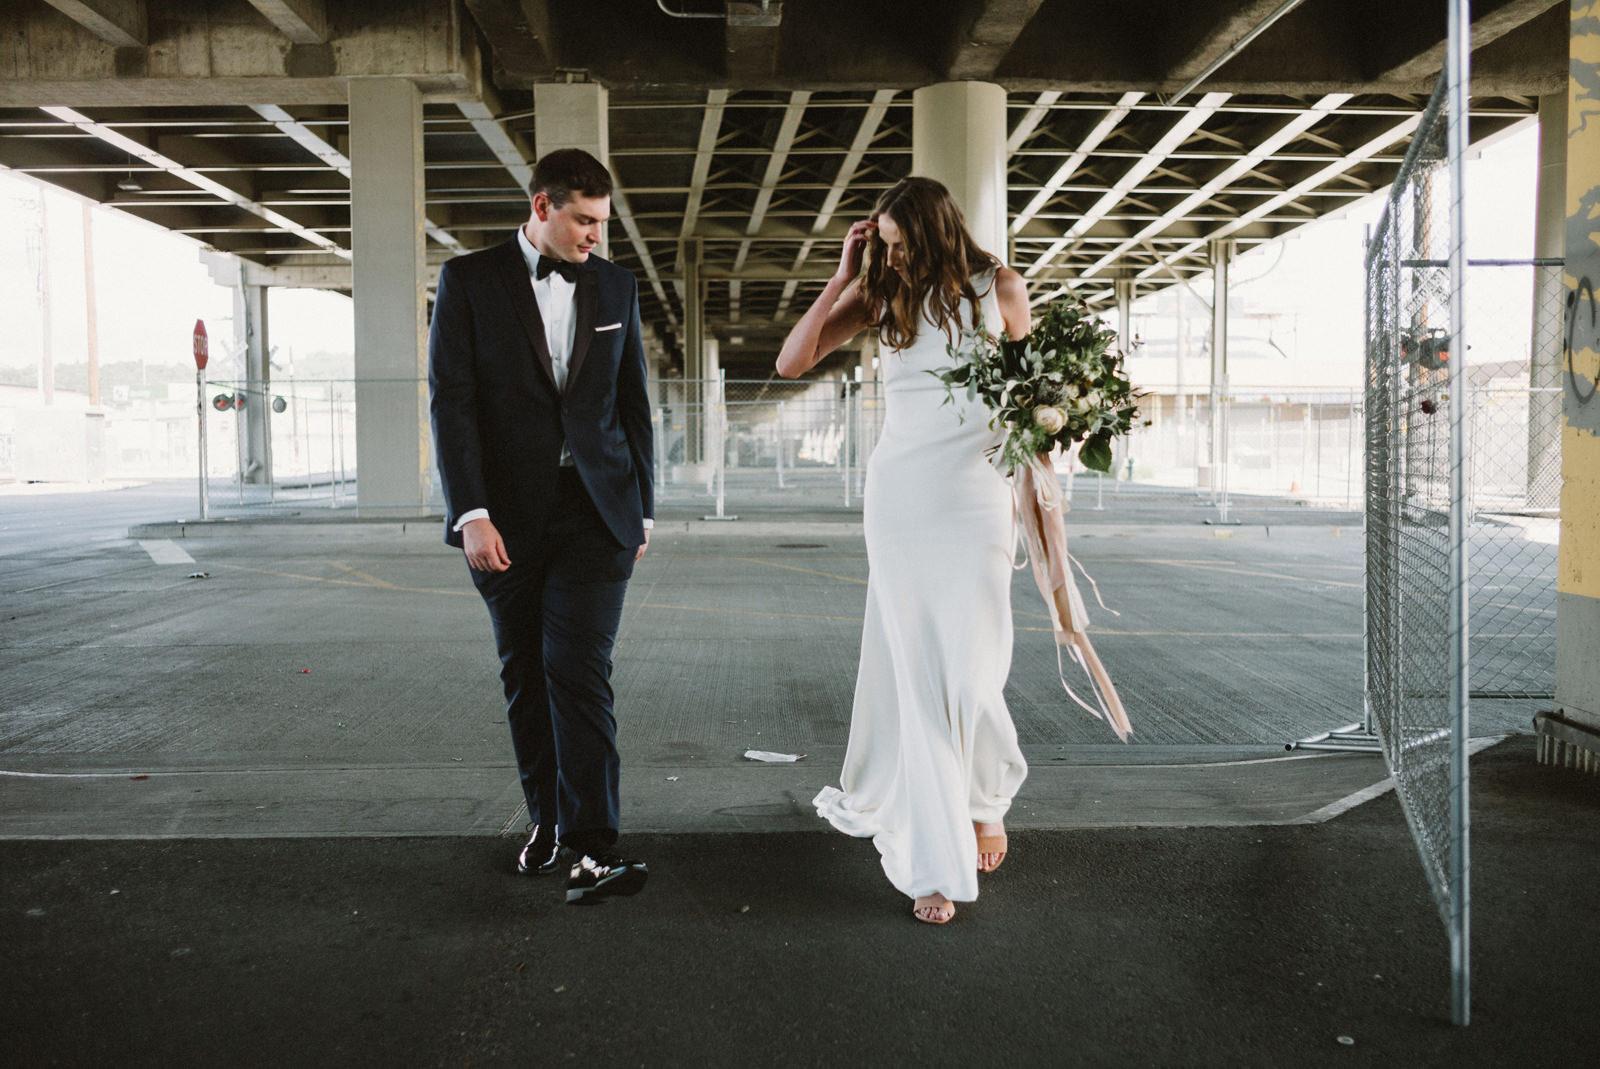 sodo-park-wedding-017 SODO PARK WEDDING